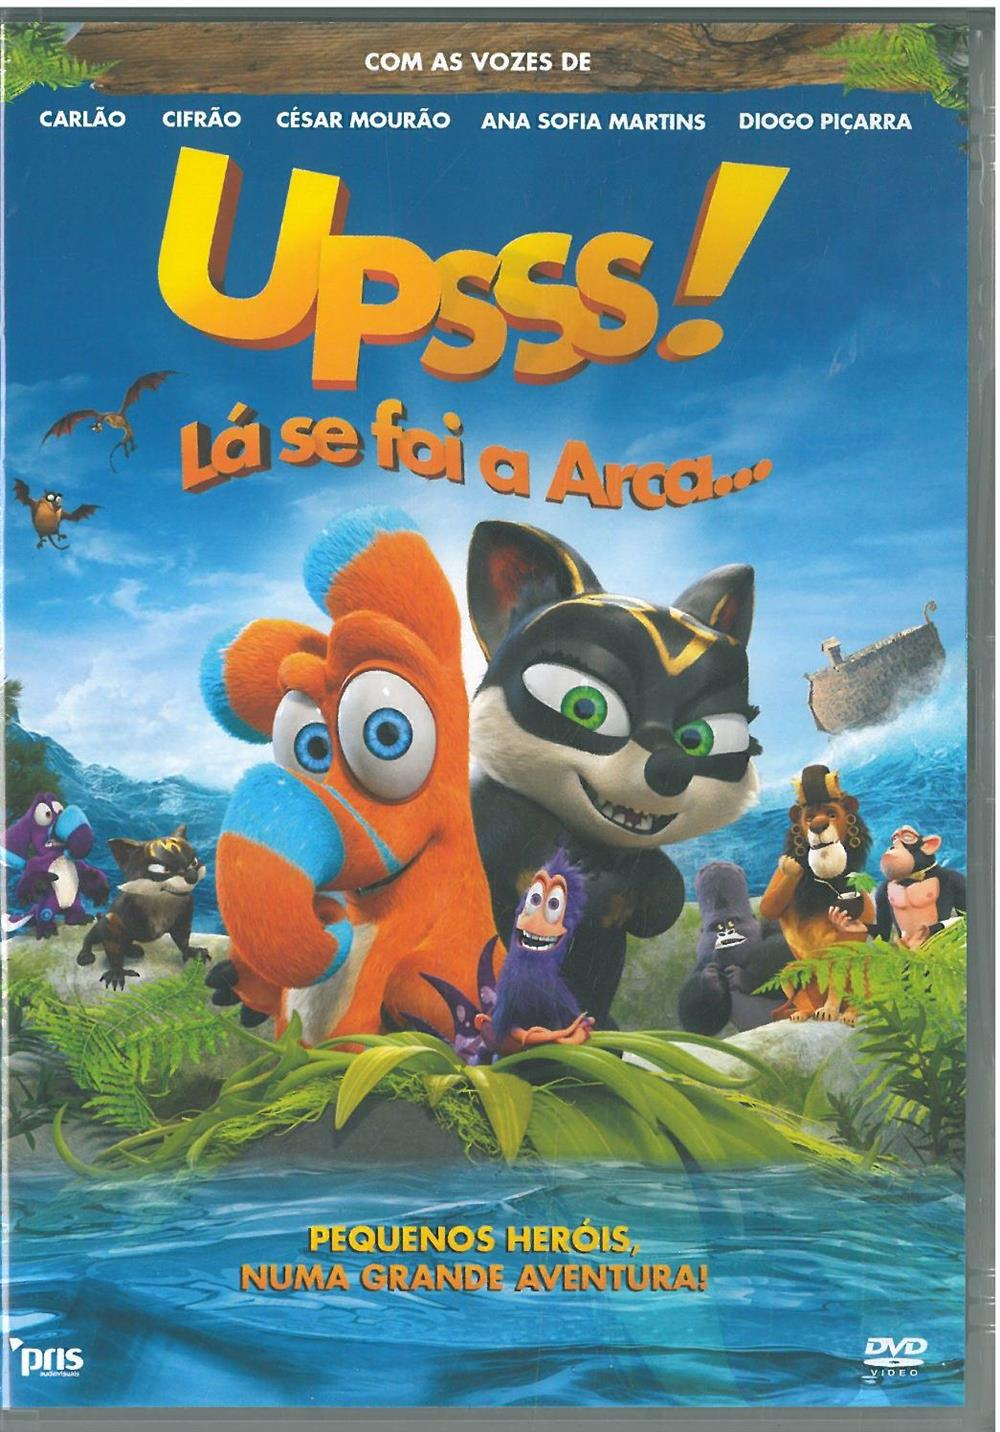 Upsss_DVD.jpg